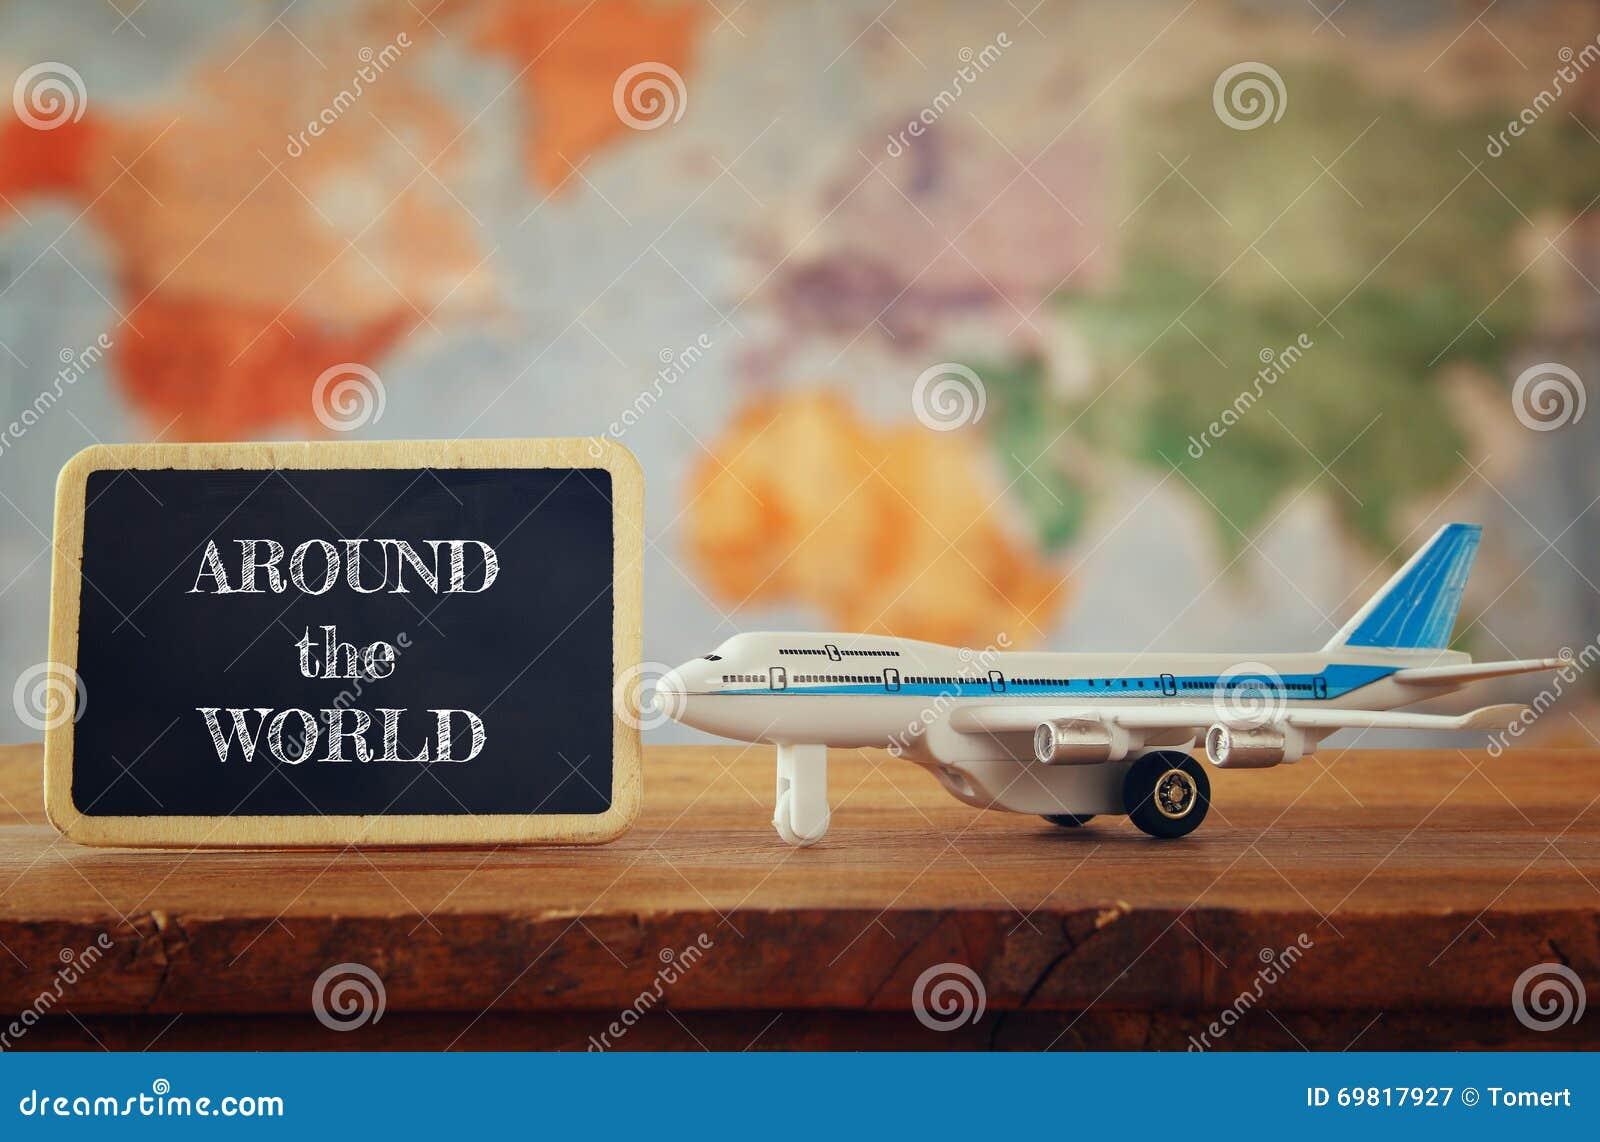 Airplane toy next to blackboard. vintage filtered image